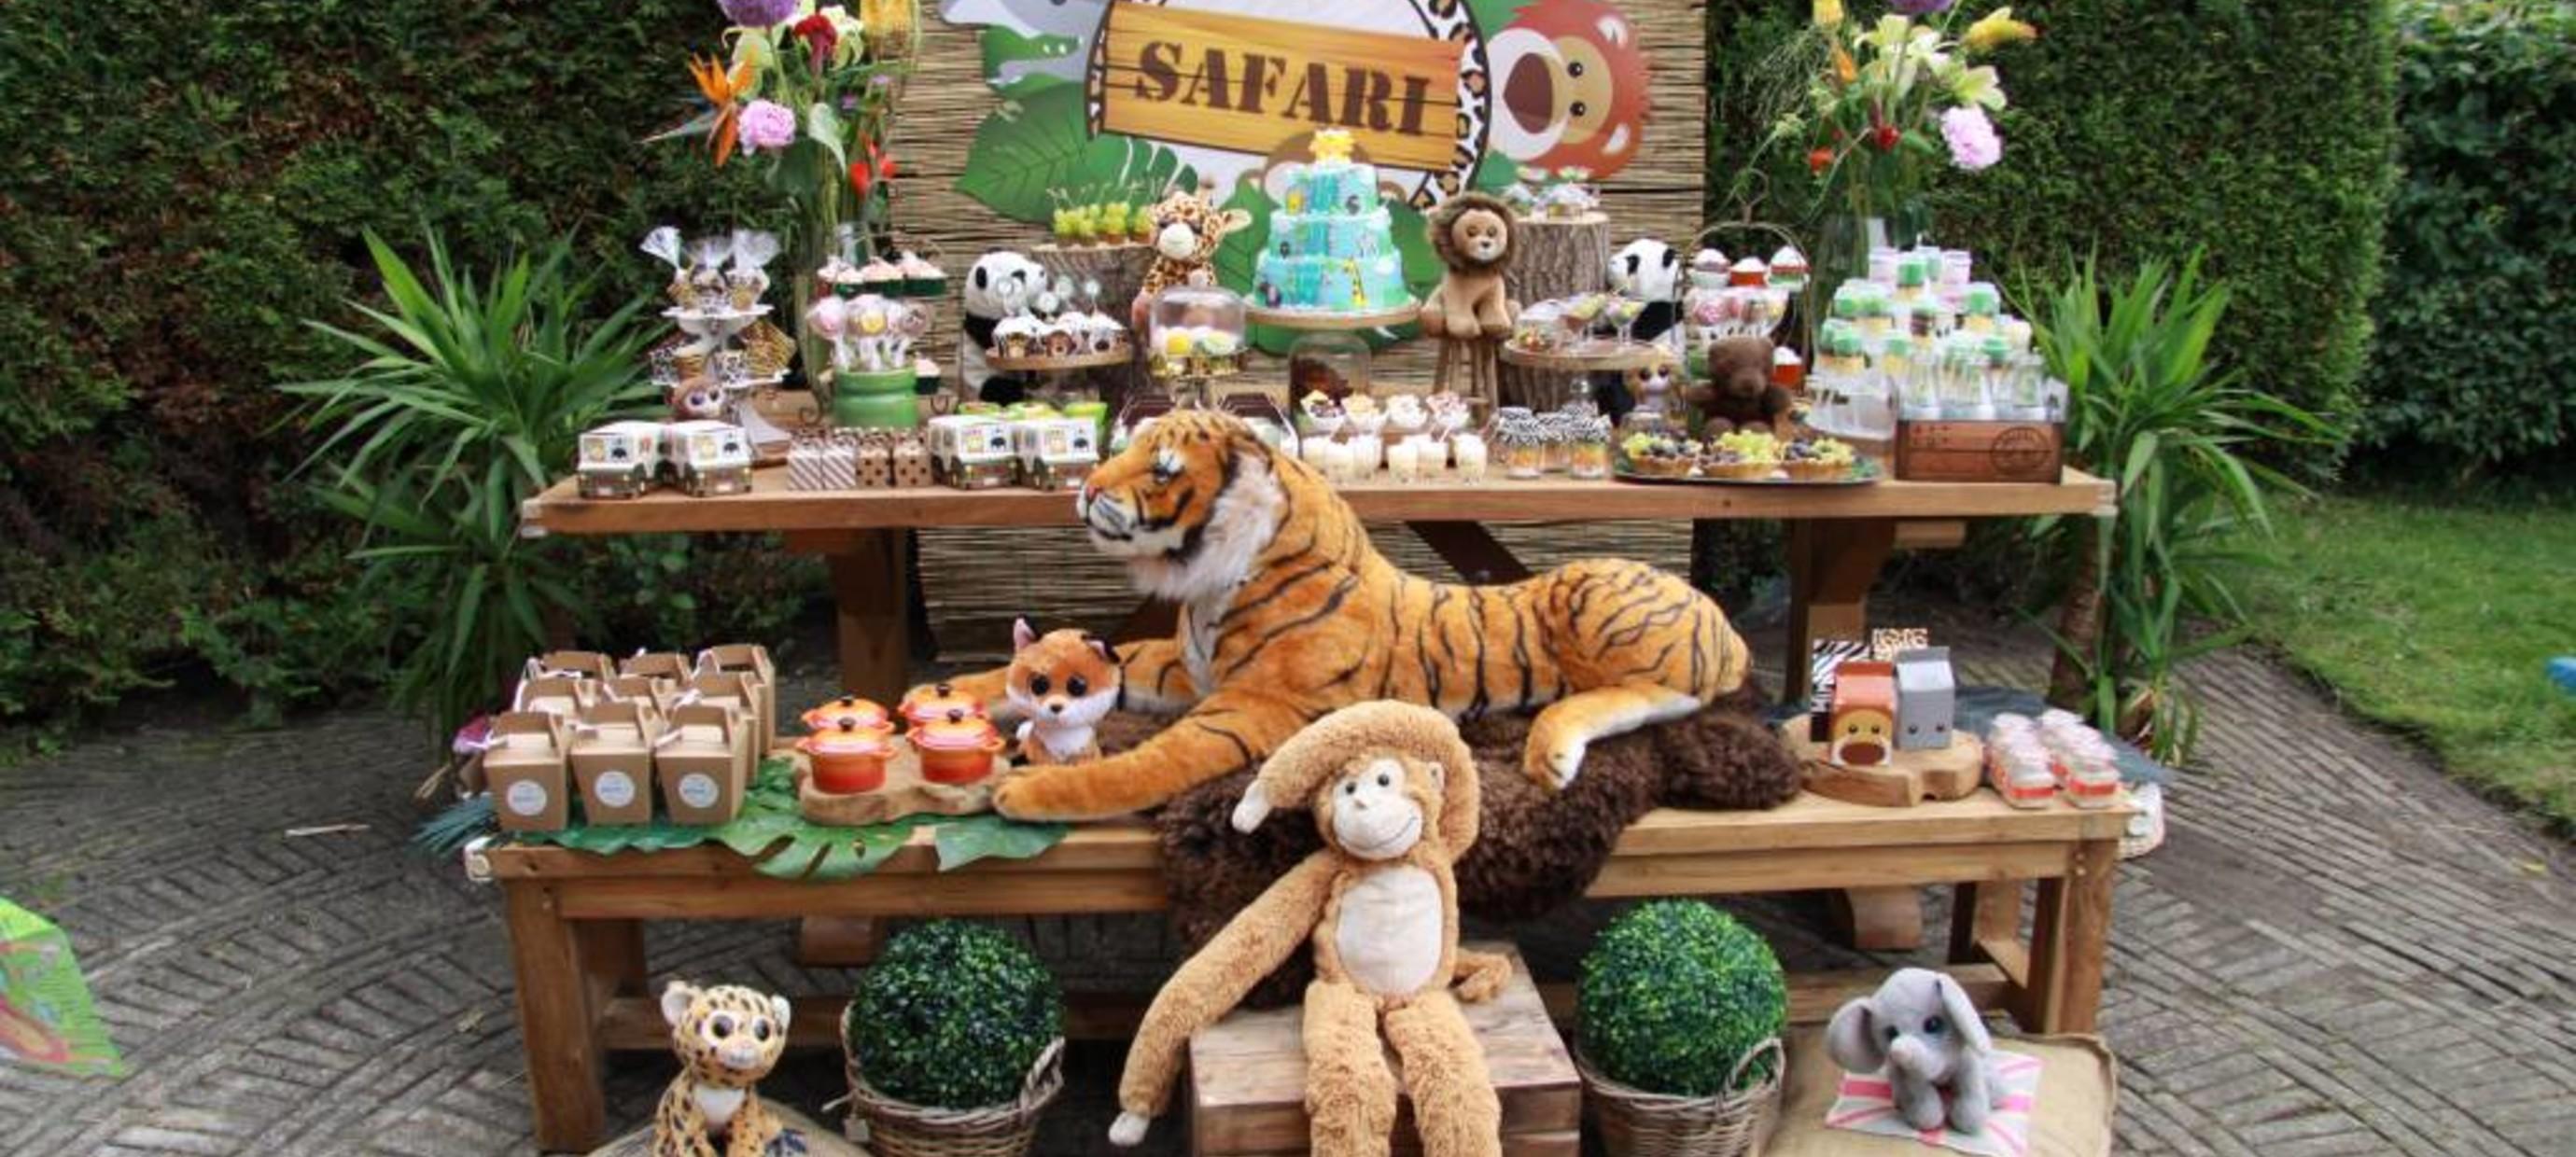 Safari – Henk's 3rd Birthday & JollyJoy Company Opening